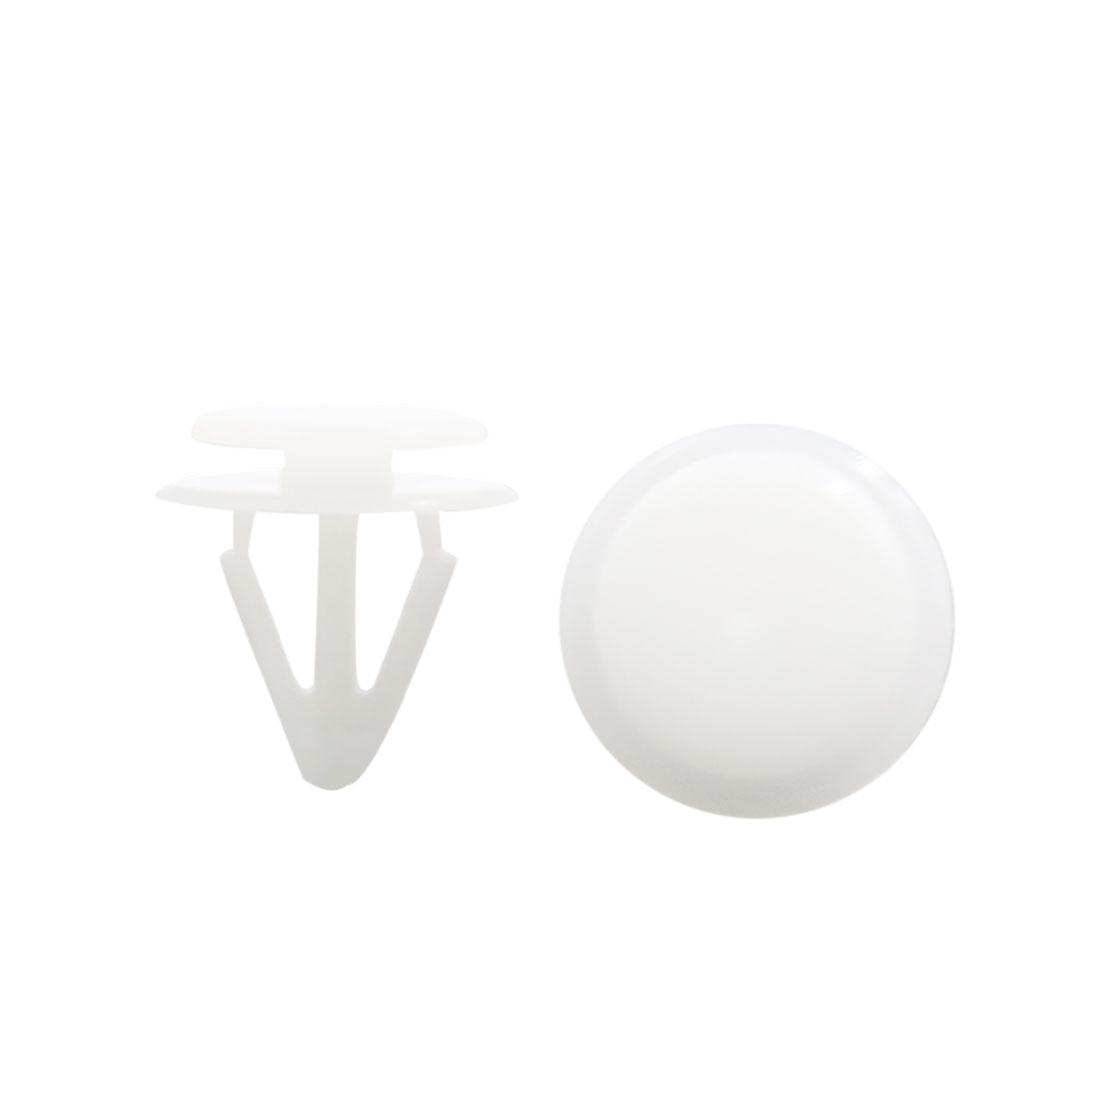 100Pcs Universal Plastic Rivets Panel Bumper Retainer Fastener Clips White 10mm